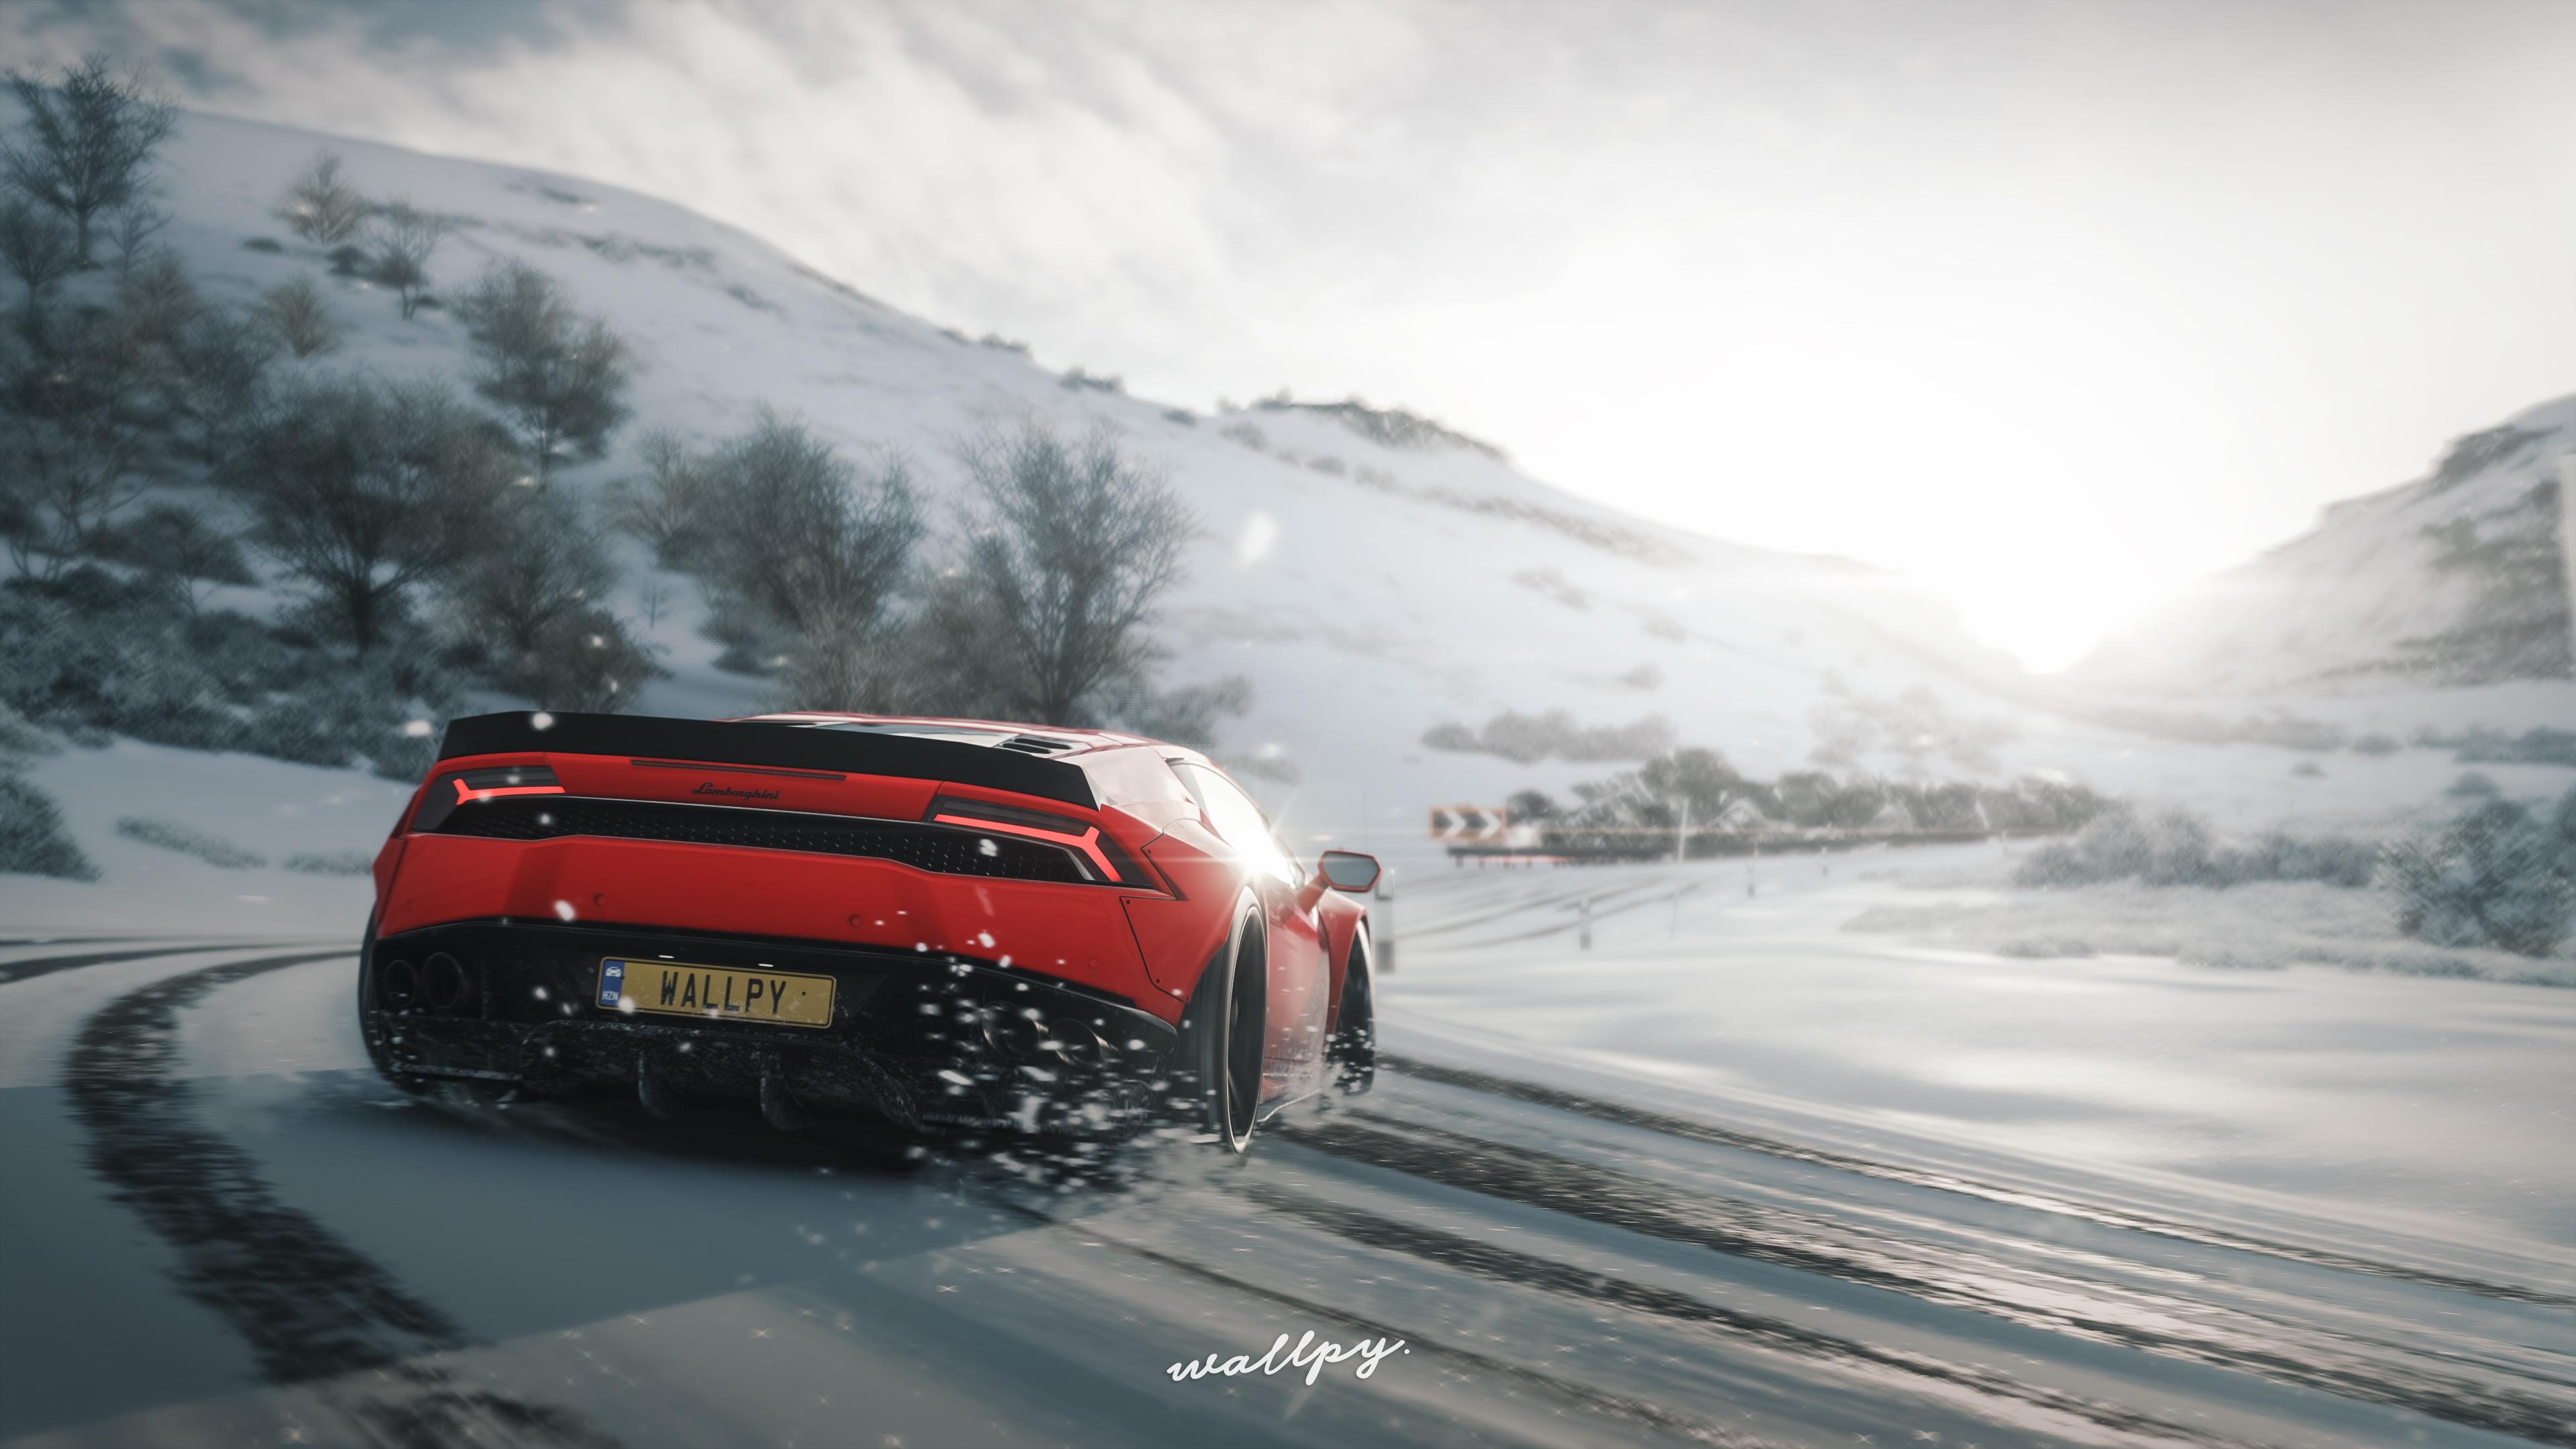 Photos Forza Horizon 4 Lamborghini Huracan By Wallpy Red